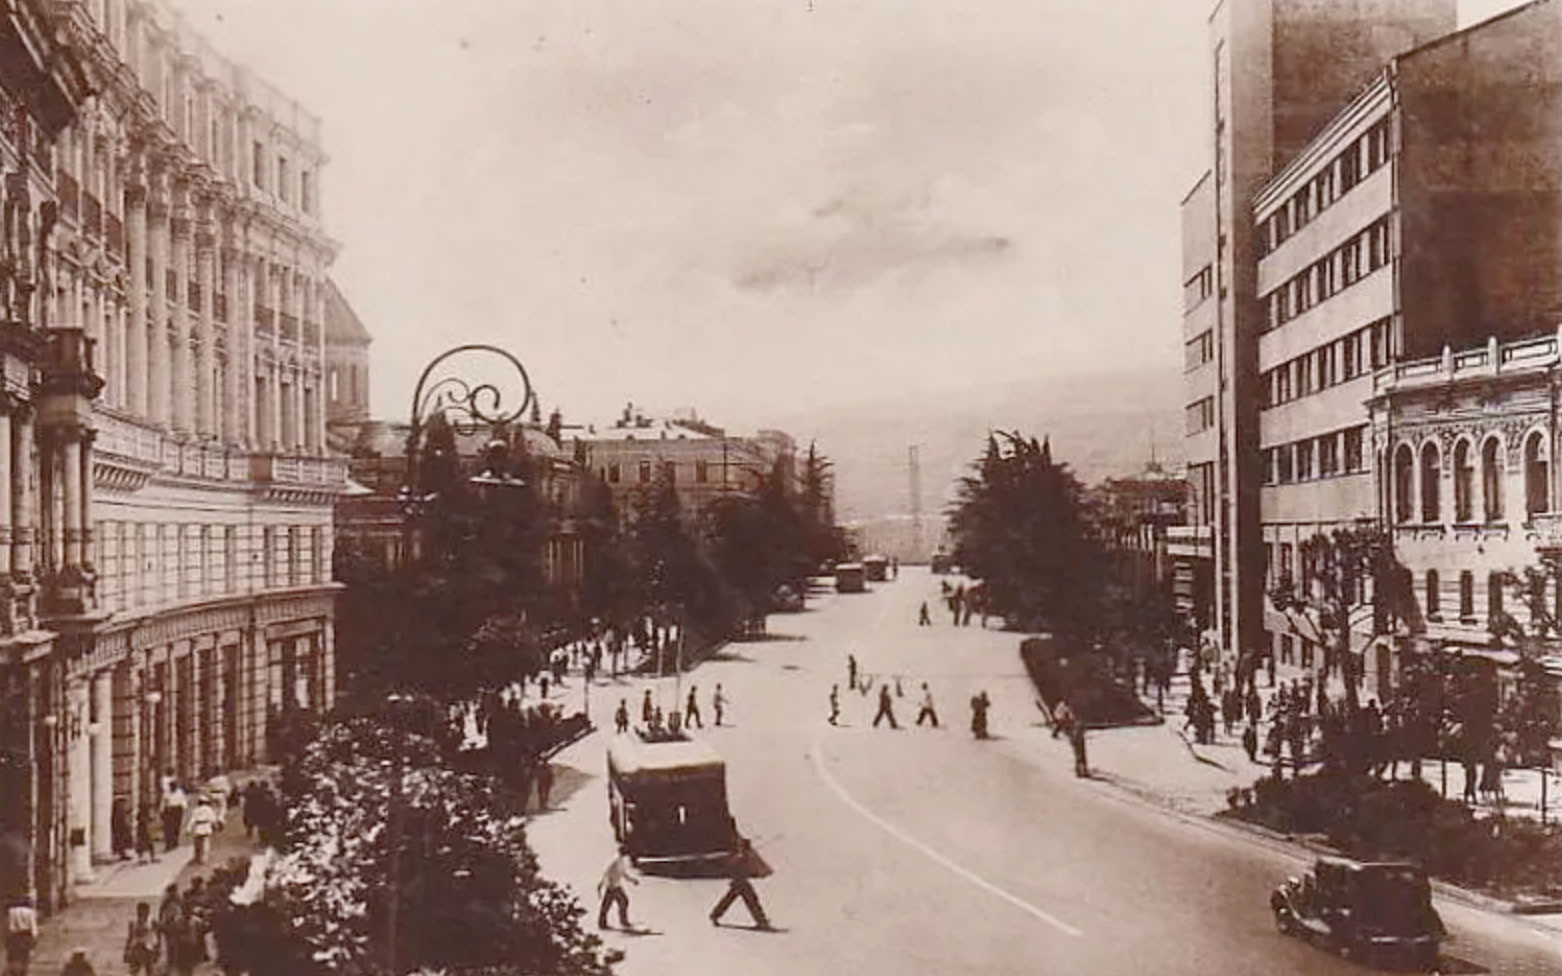 Проспект Руставели, вид в центр, справа конструктивистское здание — Дом связи. Фото: © kartli.info